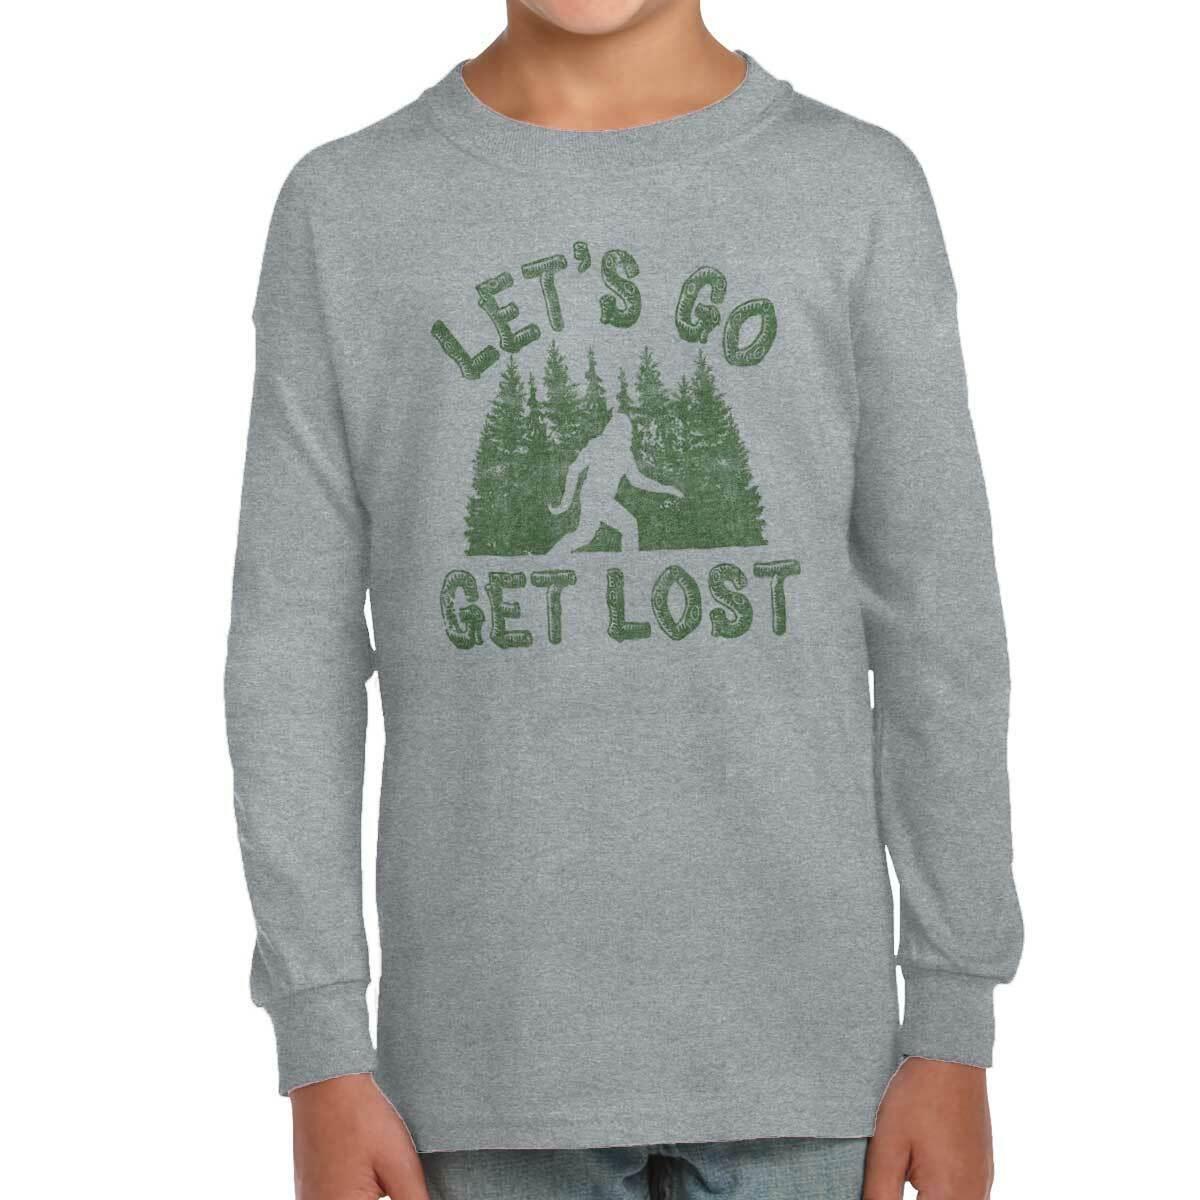 Lets Get Lost Bigfoot Urban Legend Sasquatch Youth Long Sleeve T Shirts Tshirts